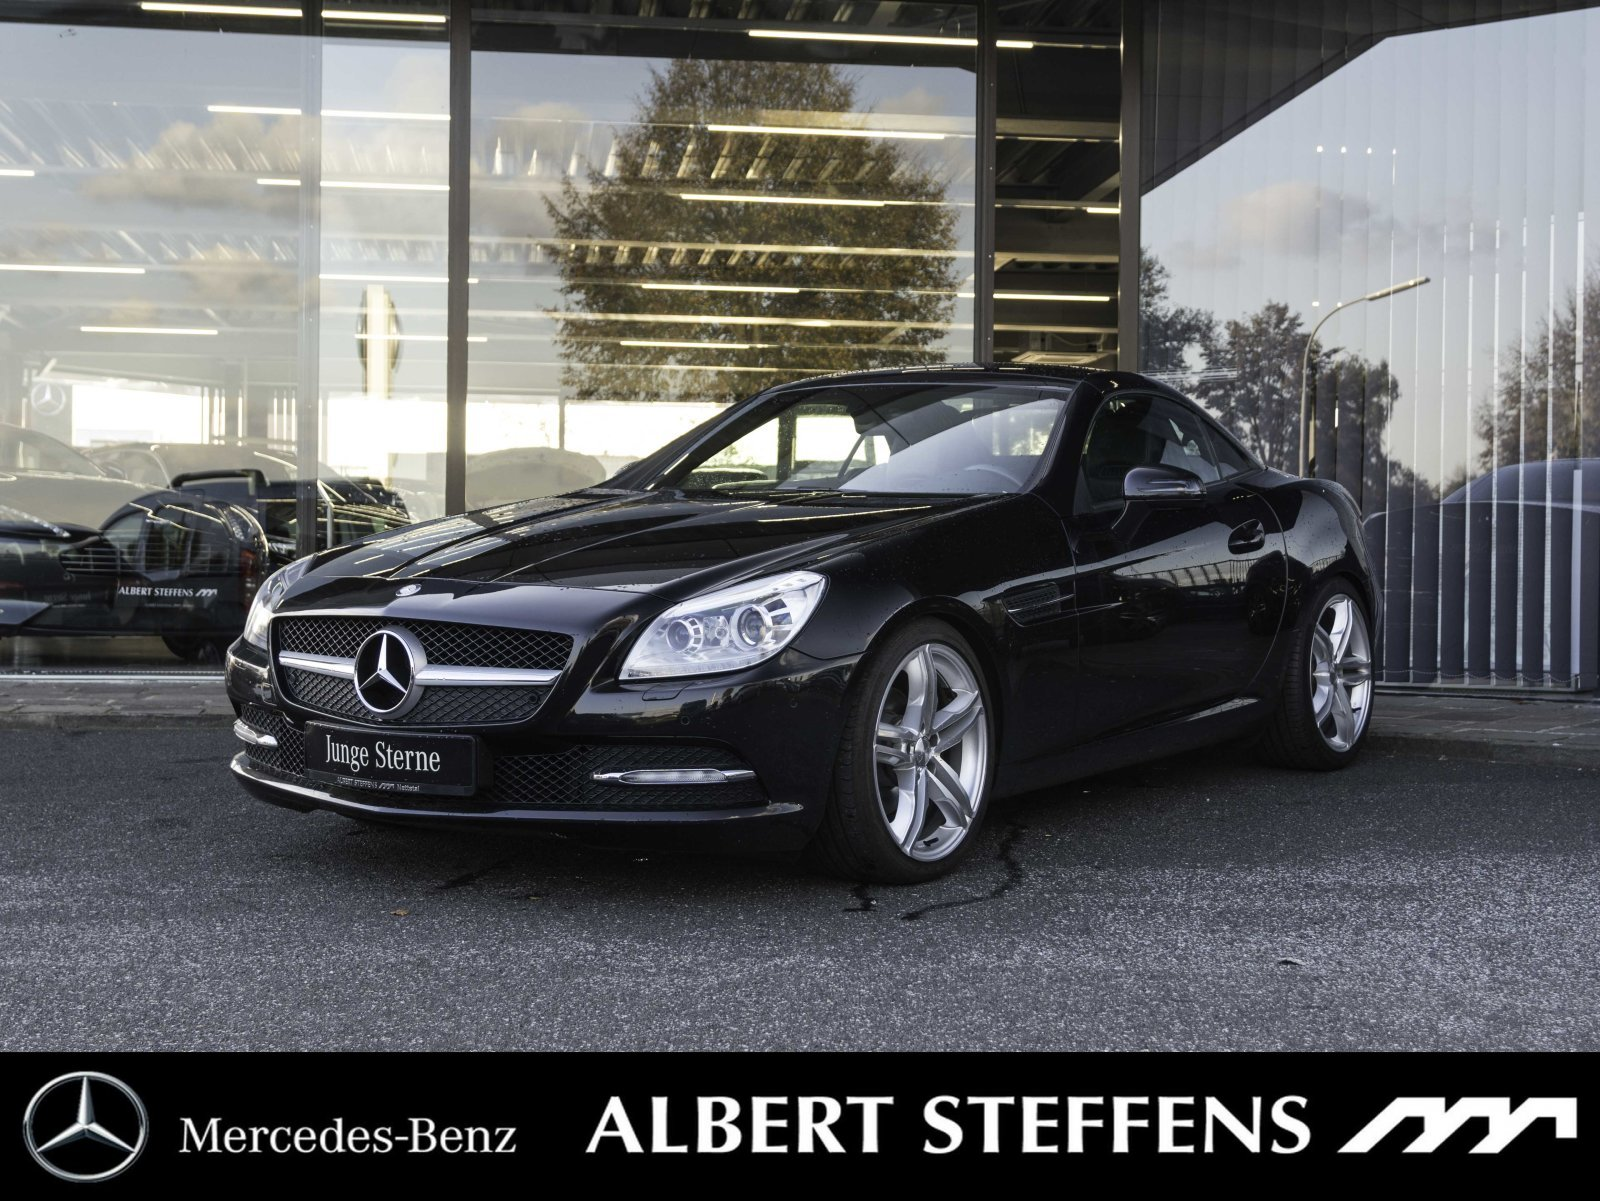 Mercedes-Benz SLK 200 Roadster Xenon*PTS*NAVI*18'' Autom./BC, Jahr 2012, petrol